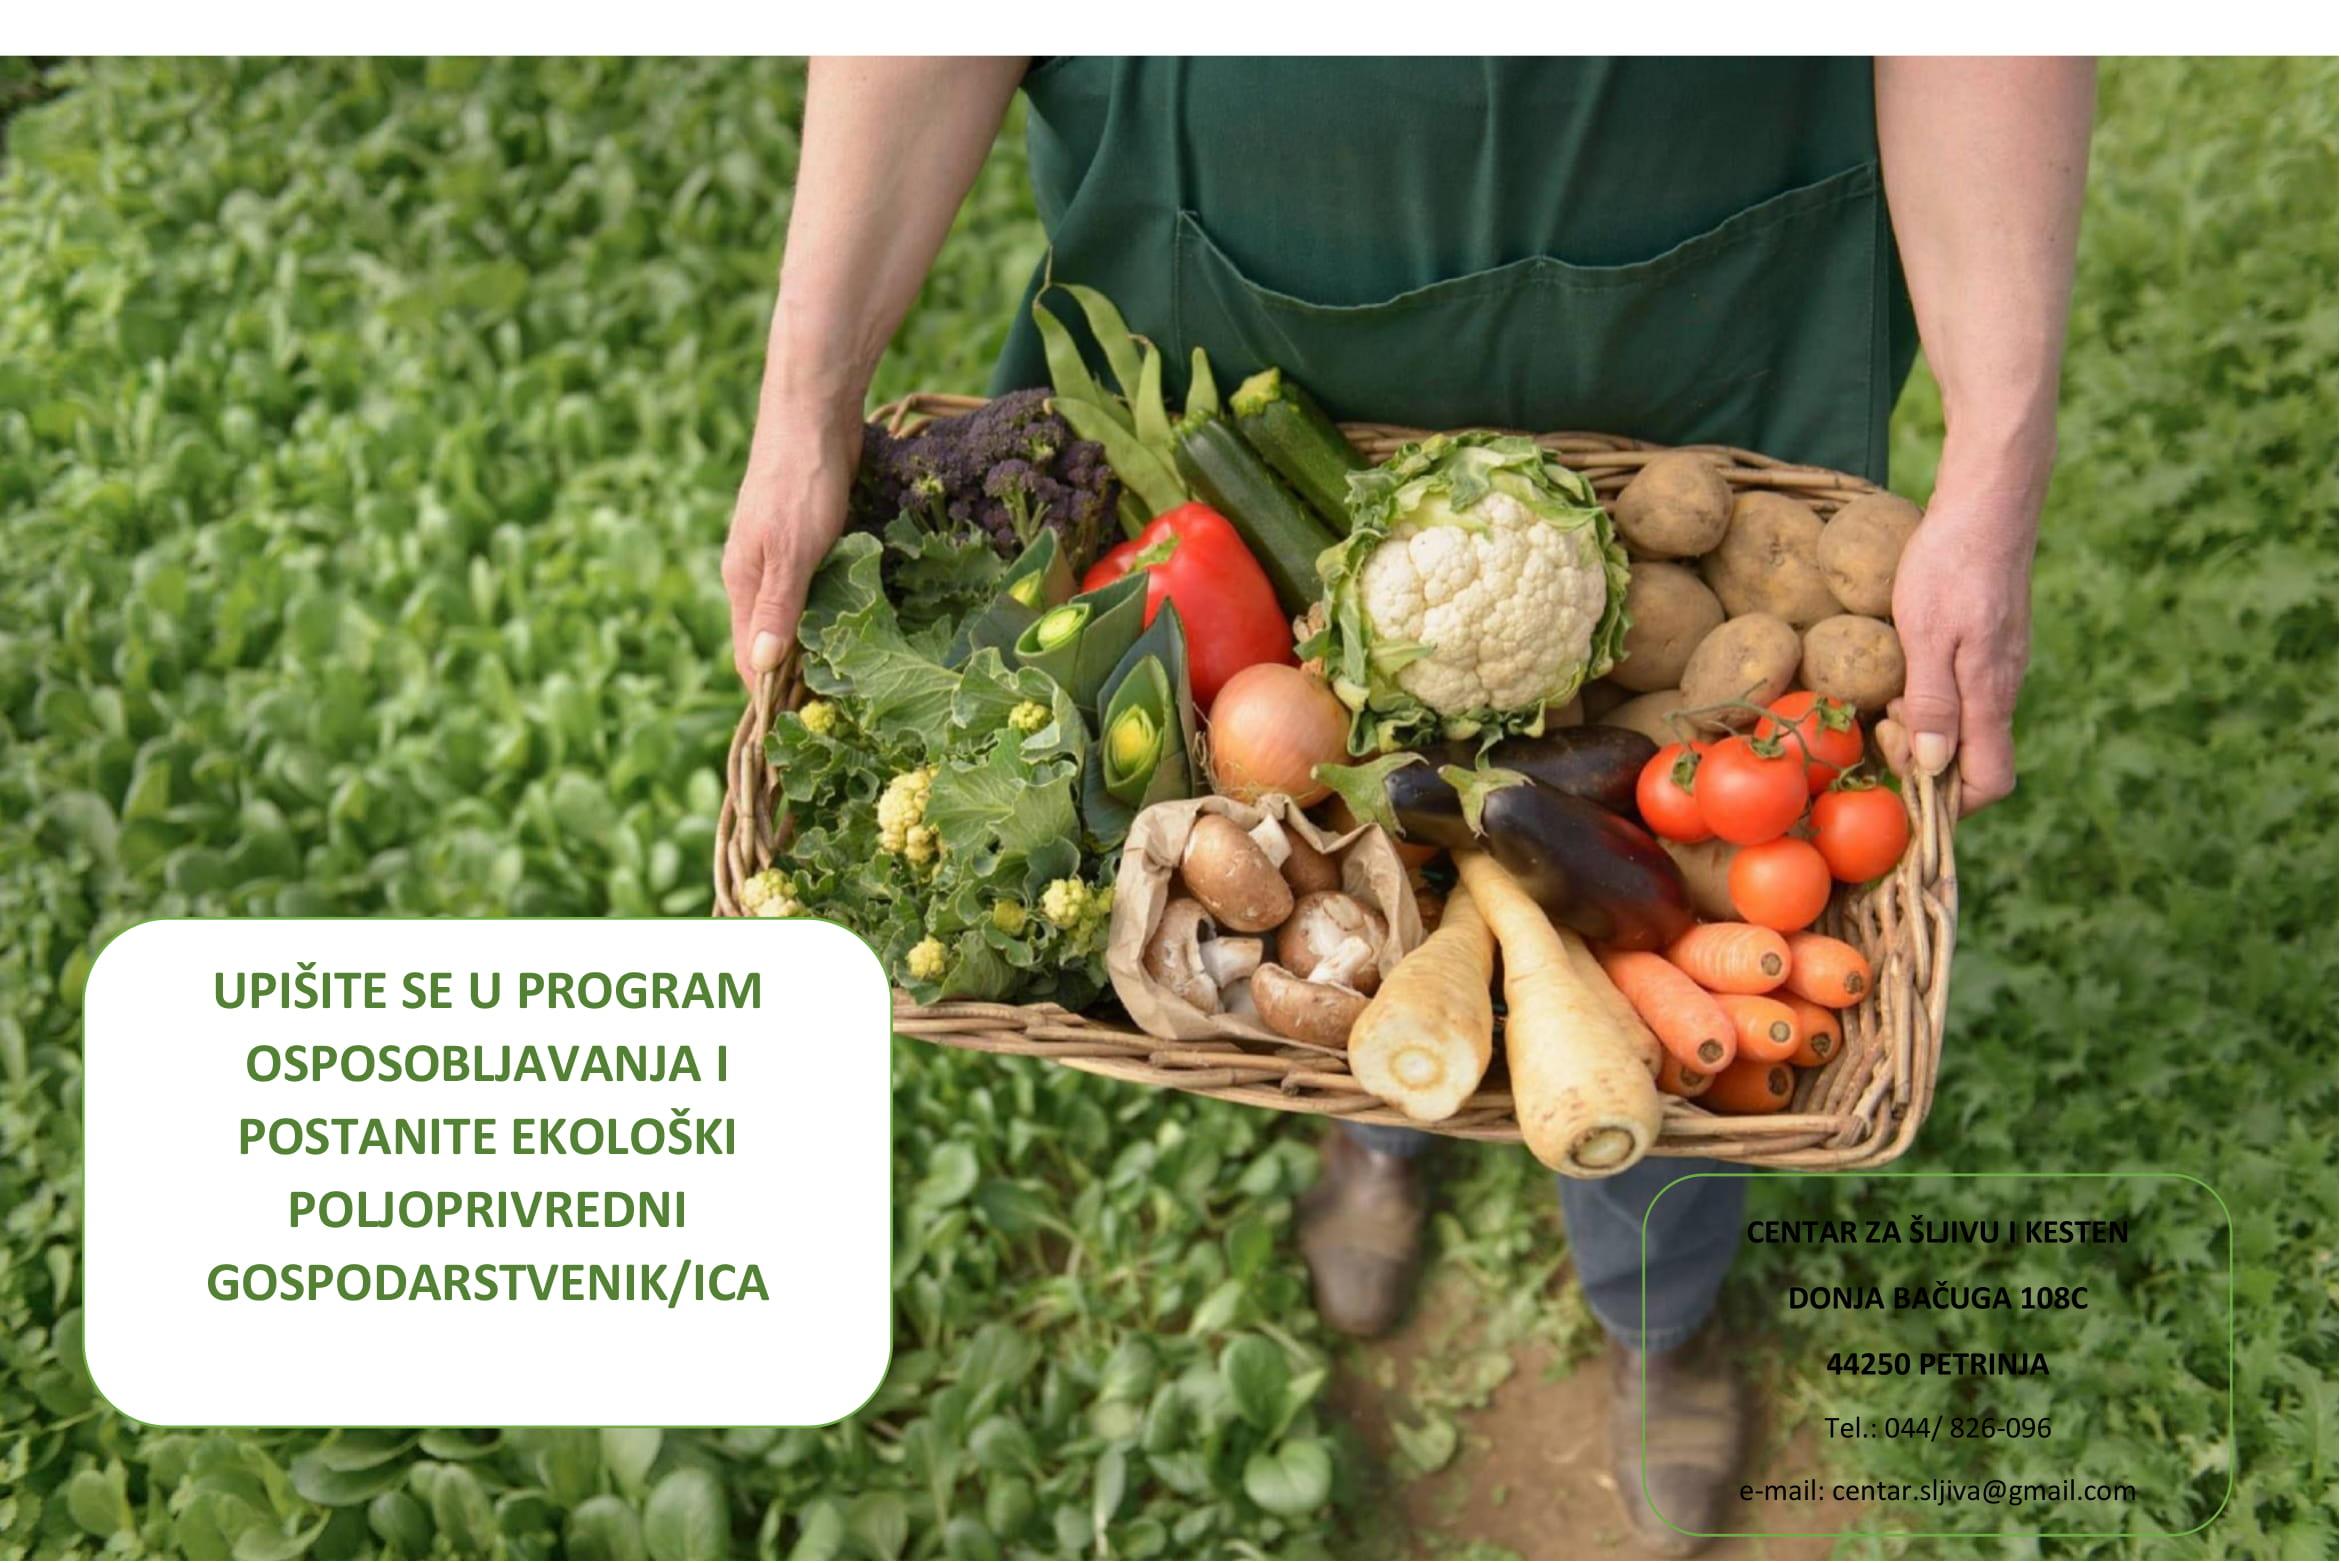 Upišite se u program osposobljavanja i postanite – EKOLOŠKI POLJOPRIVREDNI GOSPODARSTVENIK/CA